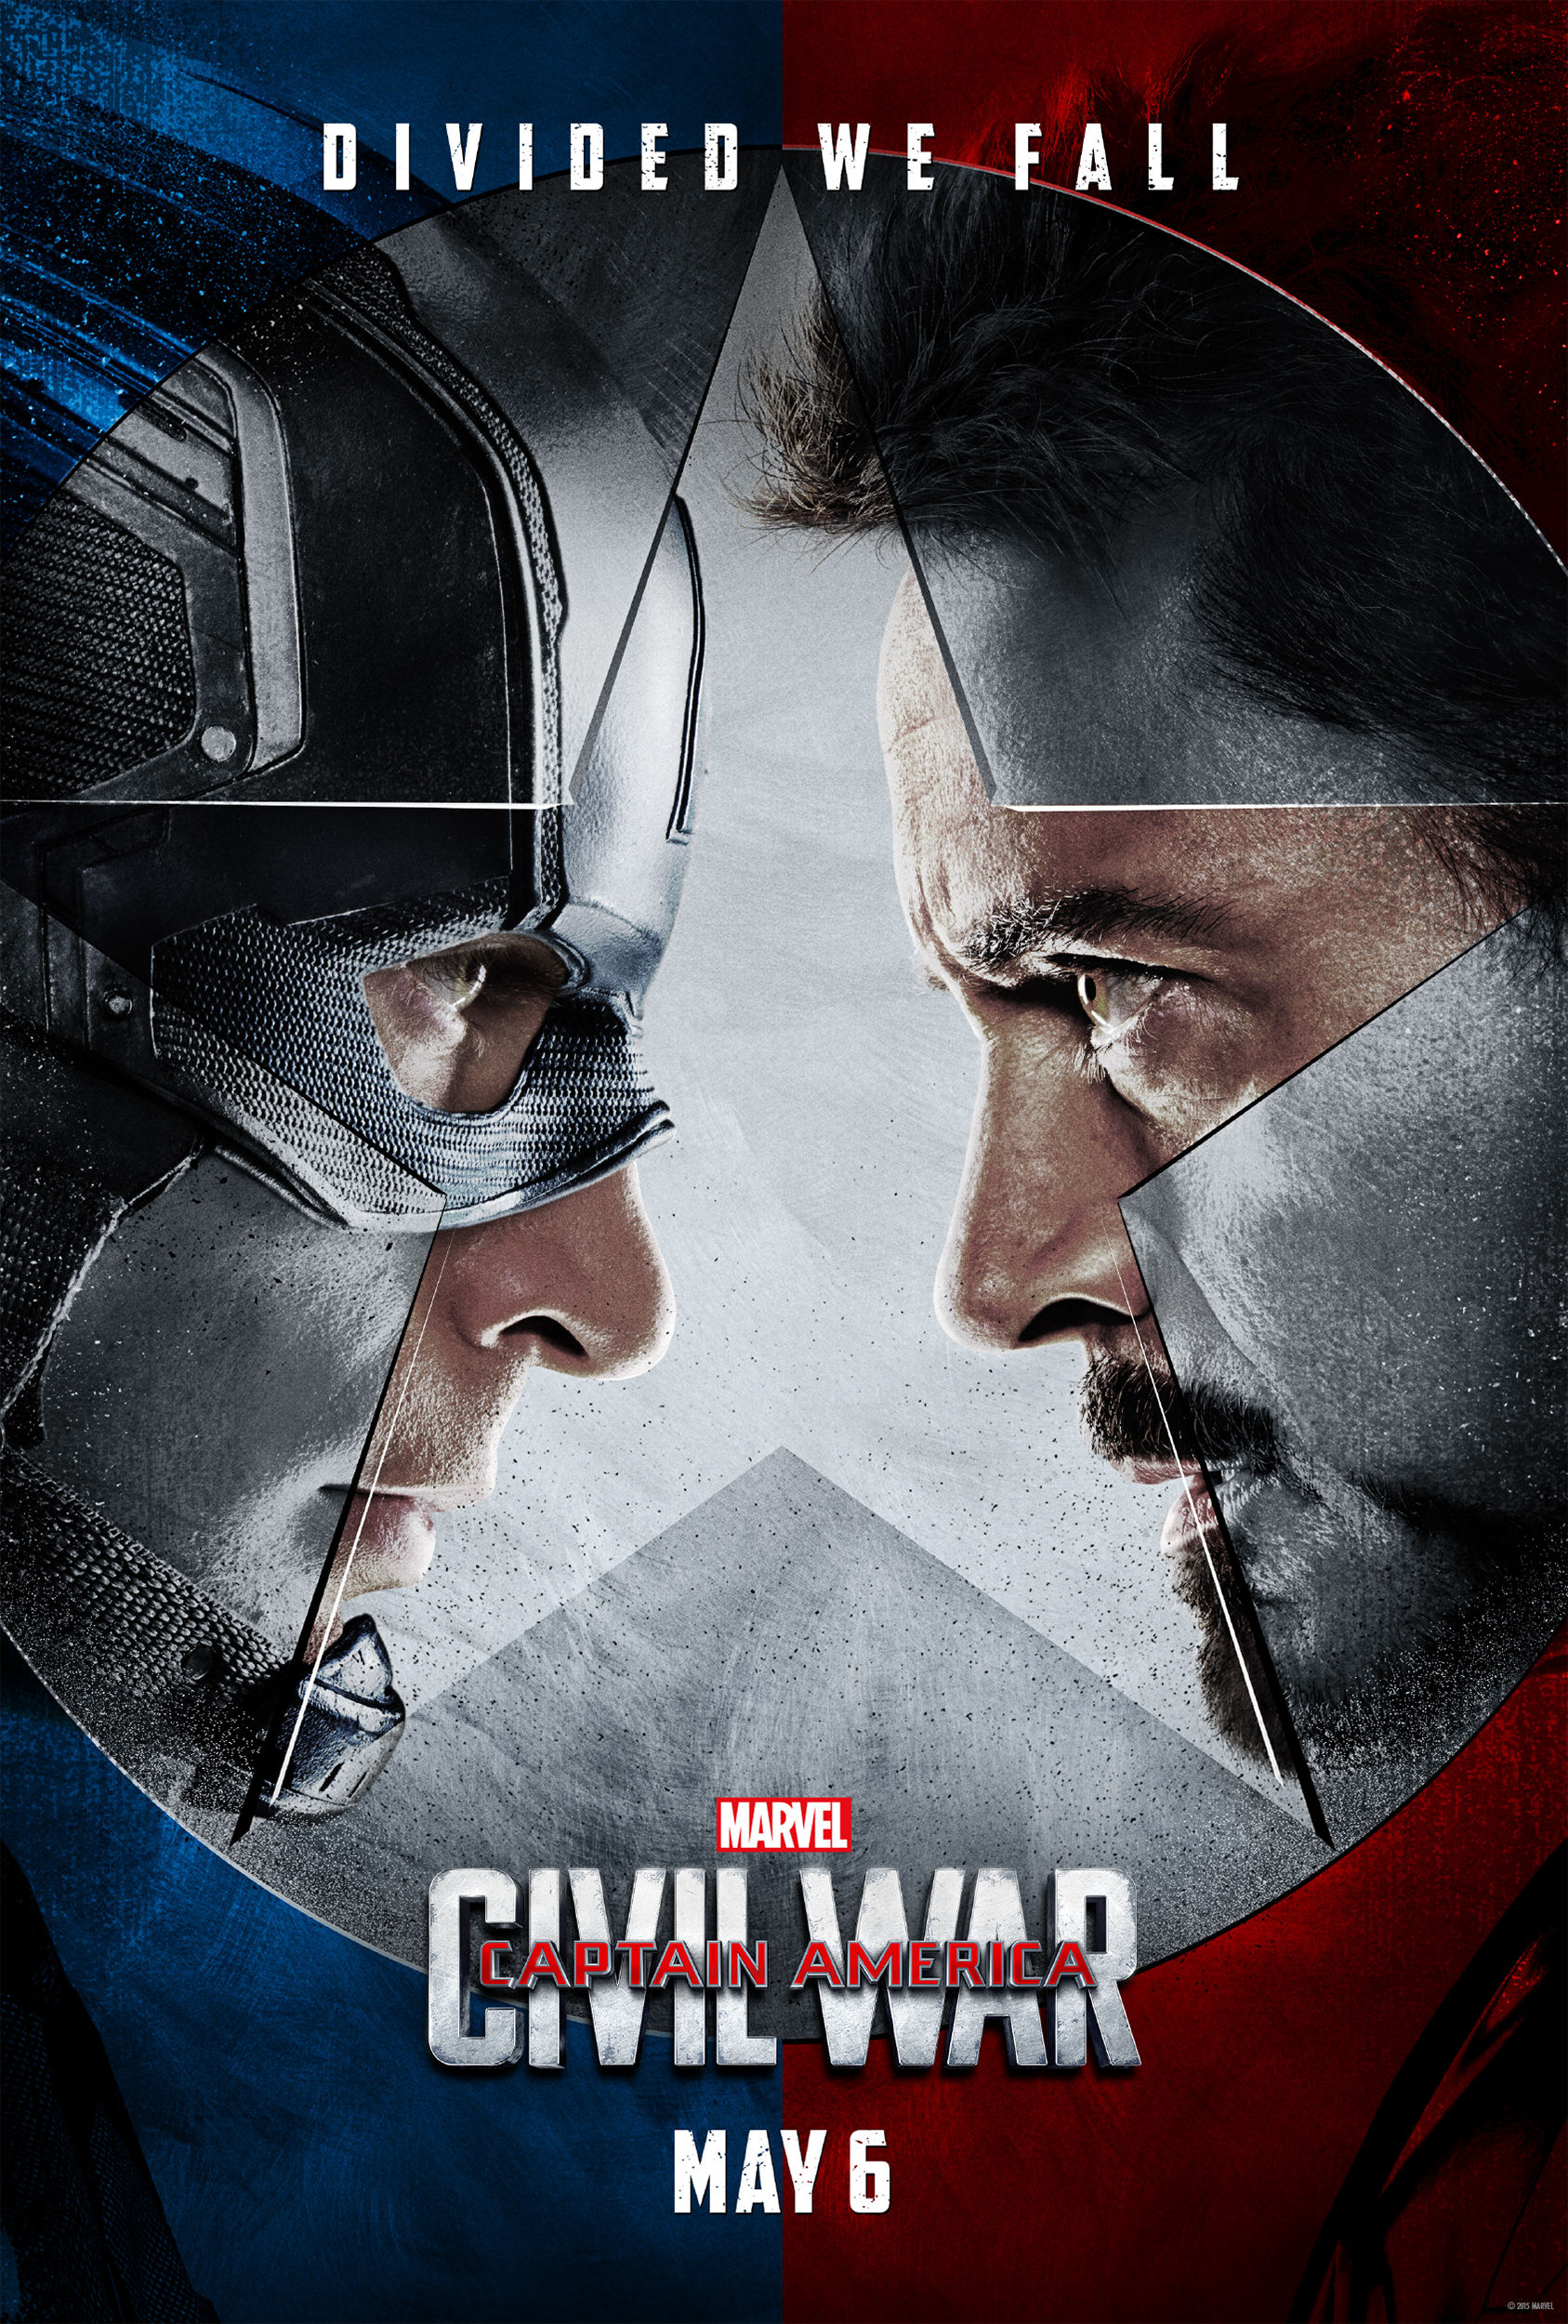 Captain America Civil War Official One Sheet Poster